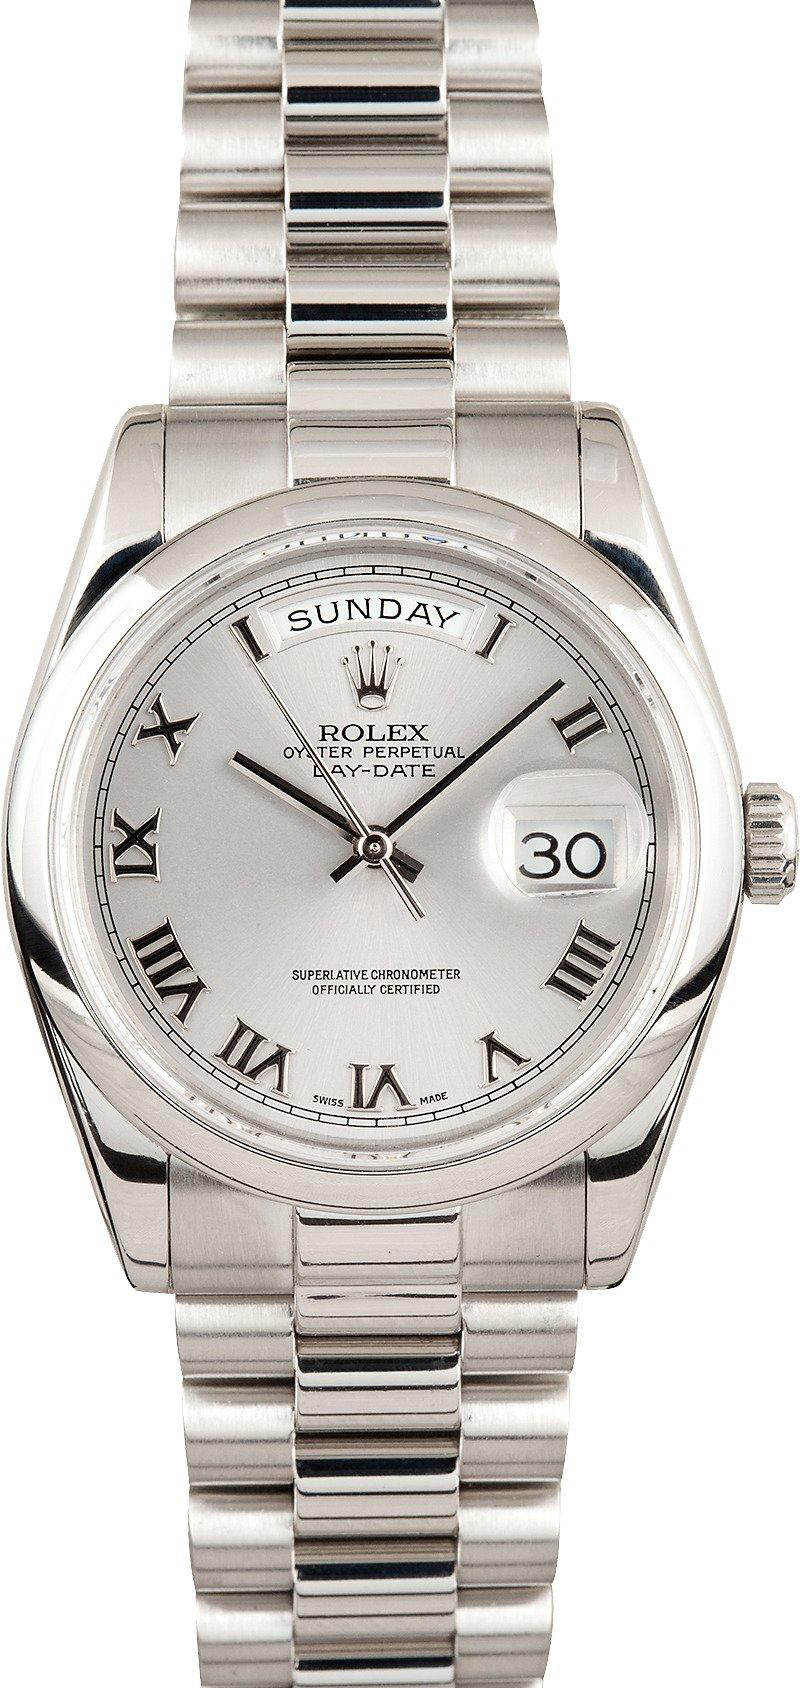 Used Rolex Daytona >> Rolex President Ref 118206 Save $1,000 - Bob's Watches